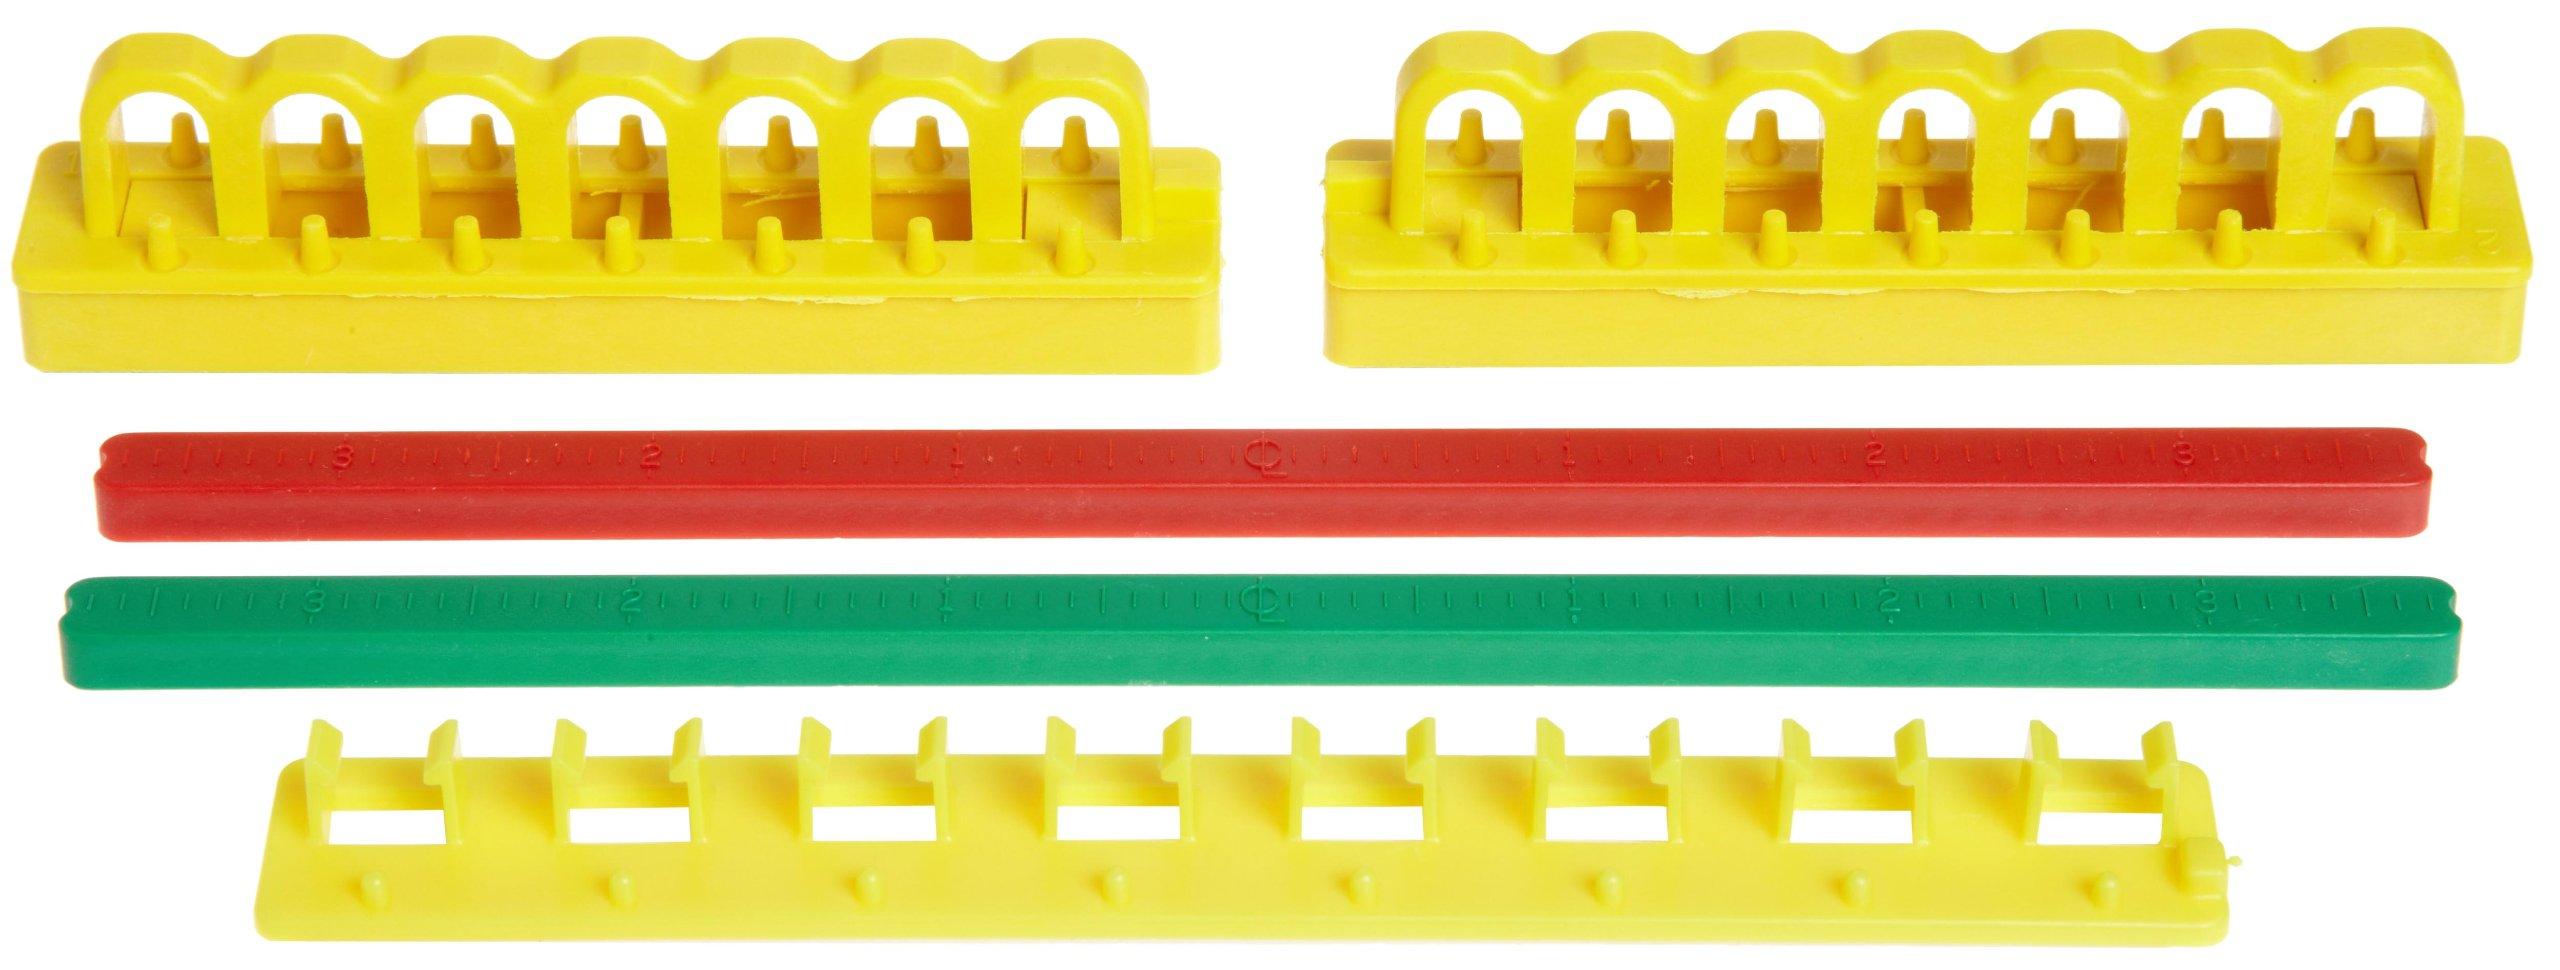 Brady 480/600V Breaker Blocker Kit